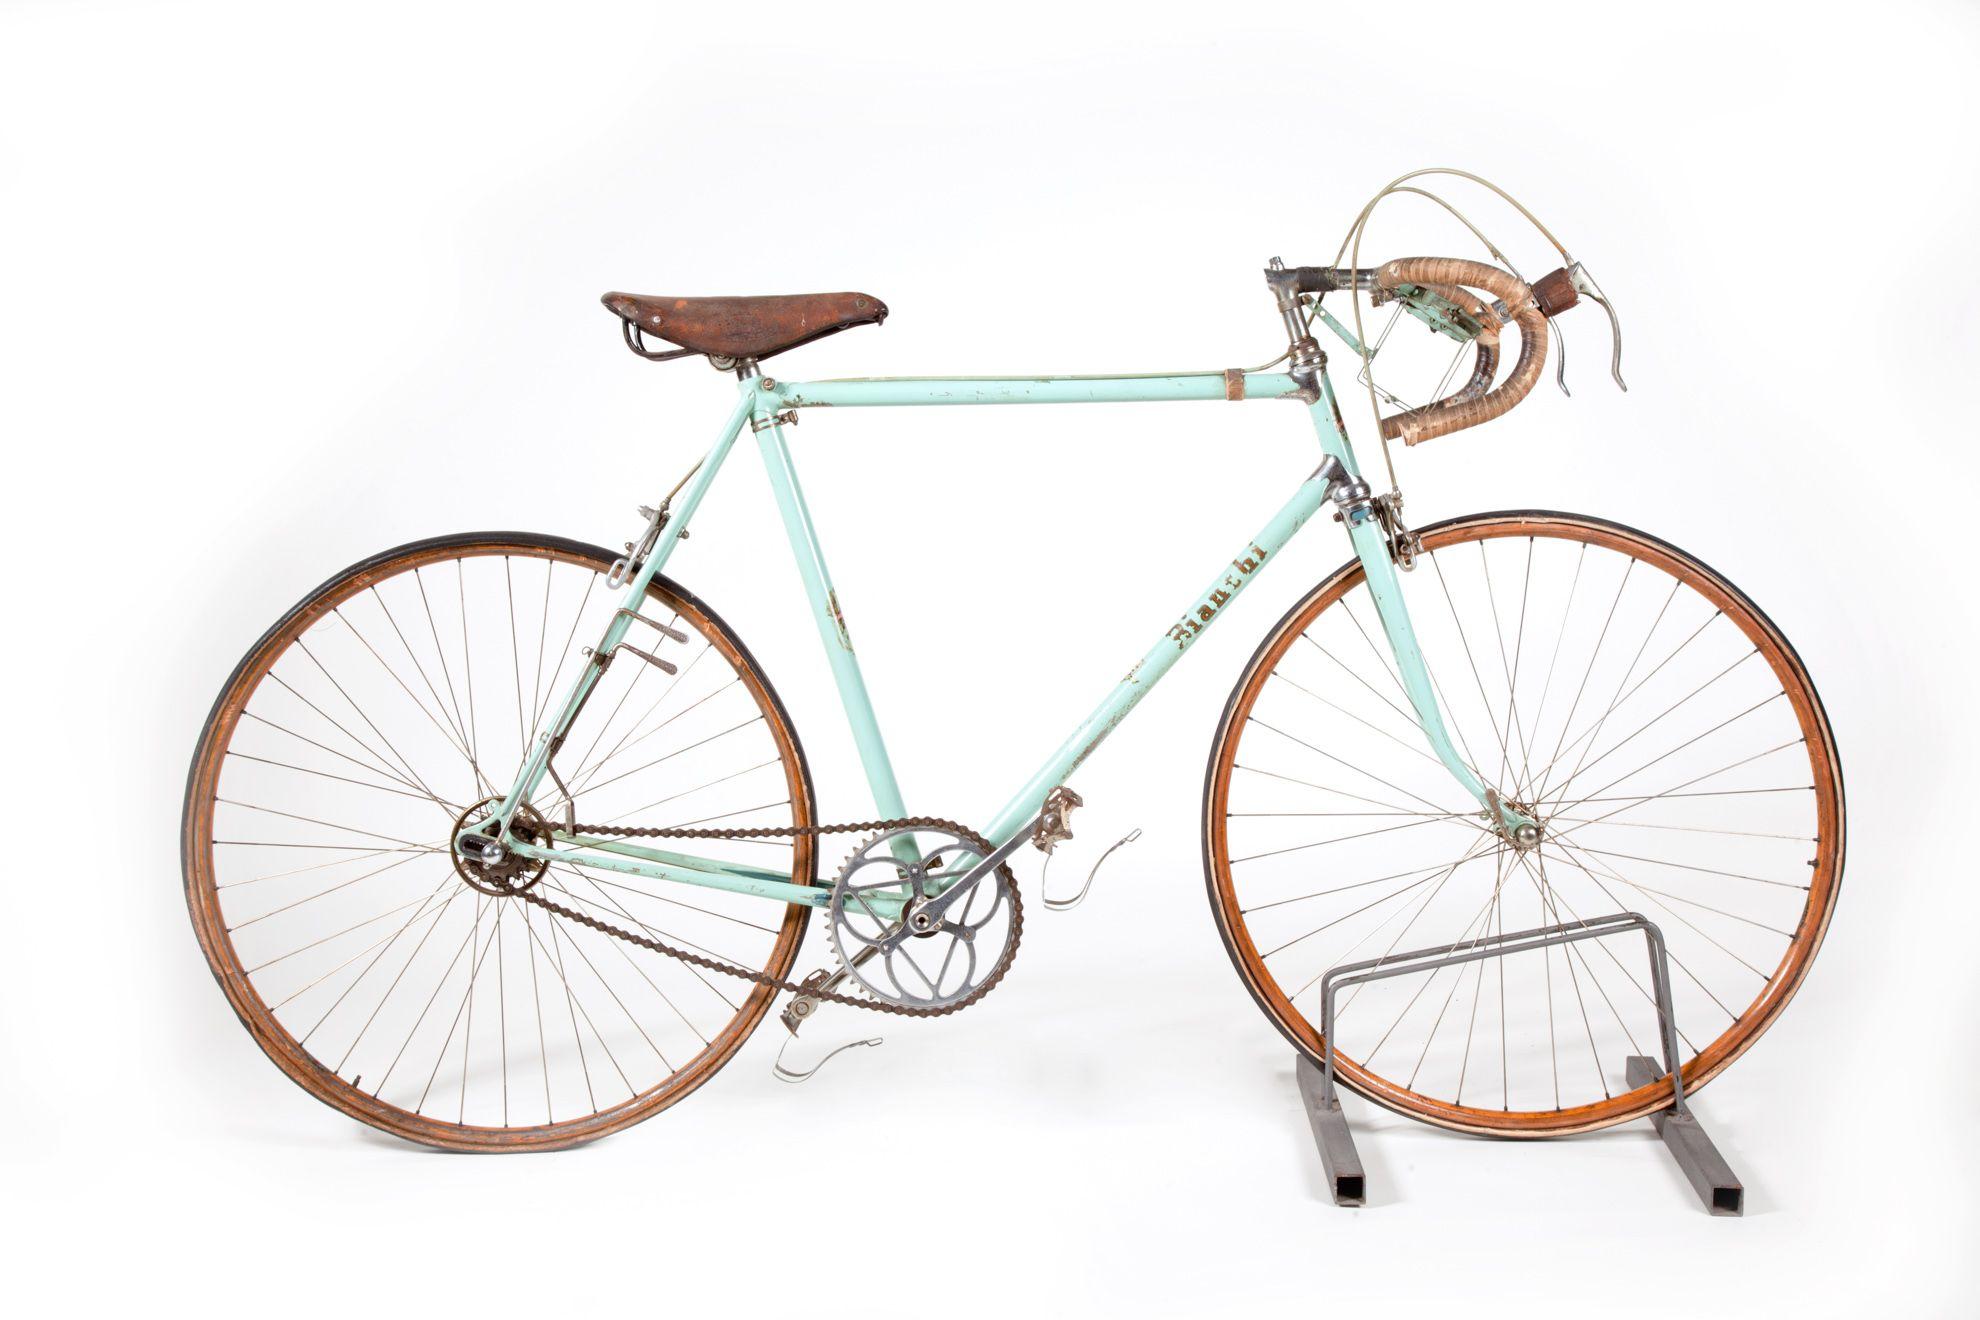 1950 1952 Bianchi Bicycle Used By Fausto Coppi In The Collections Of Museo Nazionale Della Scienza E Della Tecnolo Bicycle Road Bike Vintage Classic Road Bike